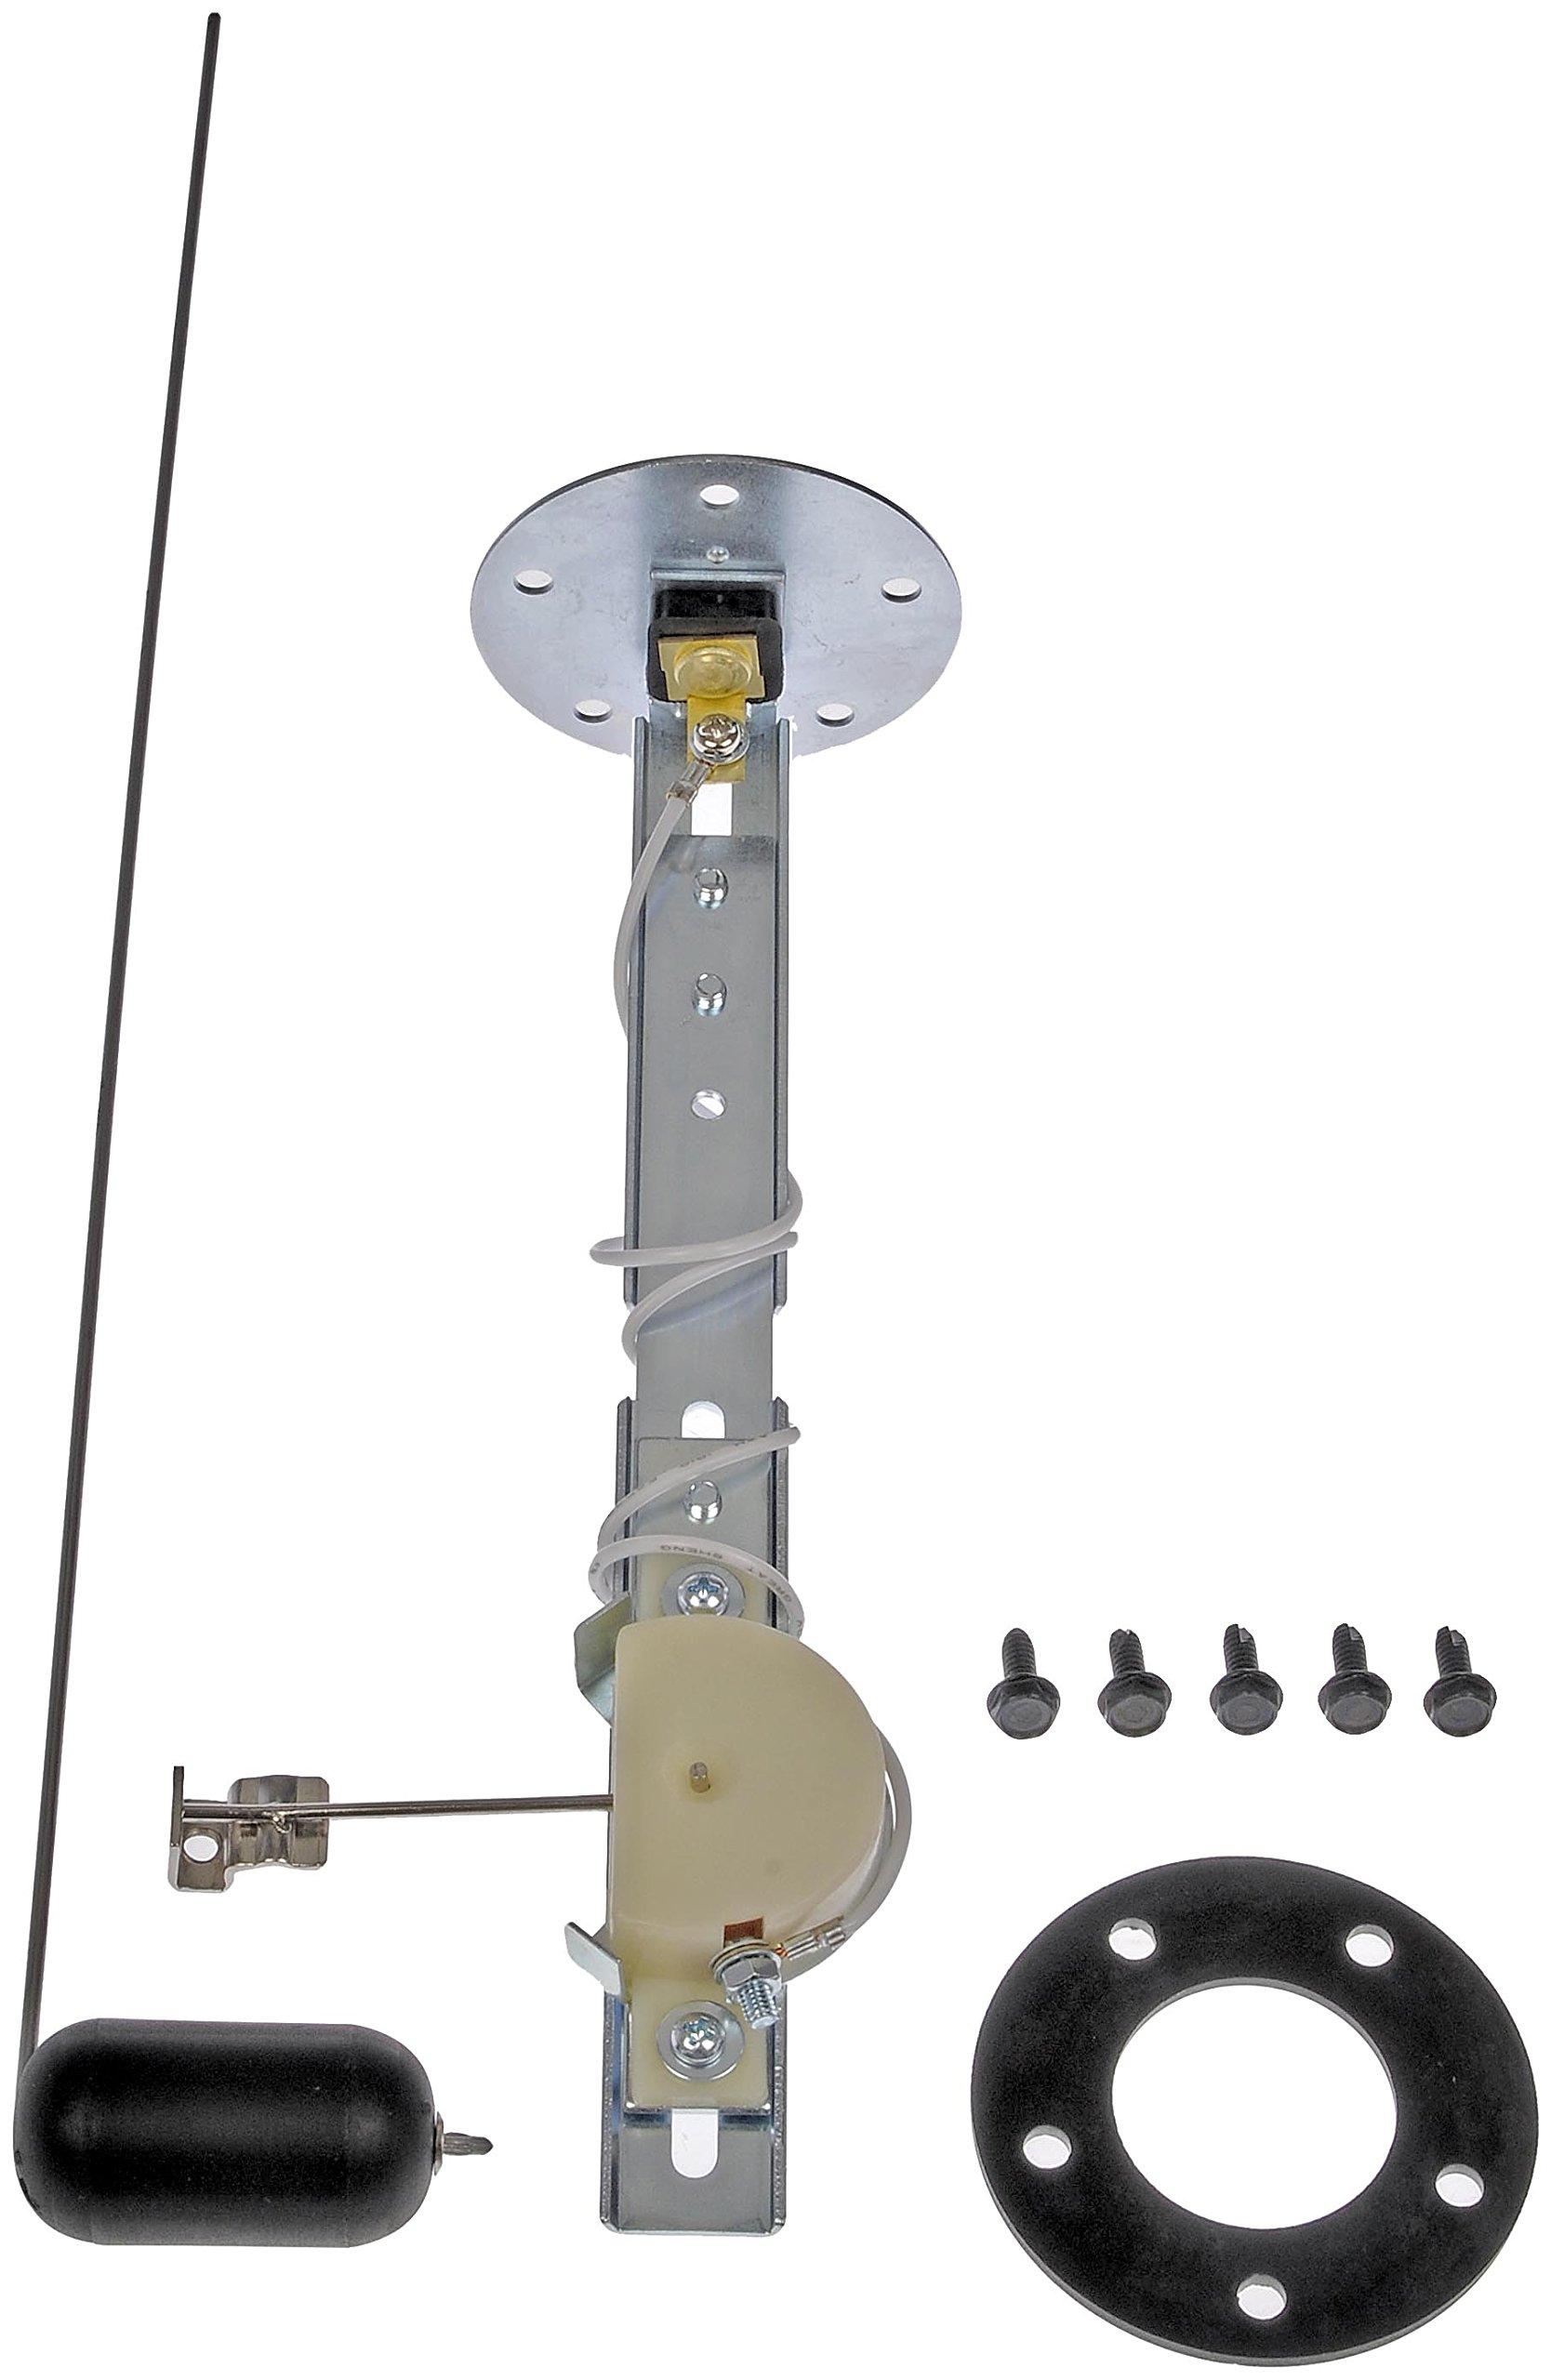 Dorman Help! 55818 Fuel Level Sending Unit Kit